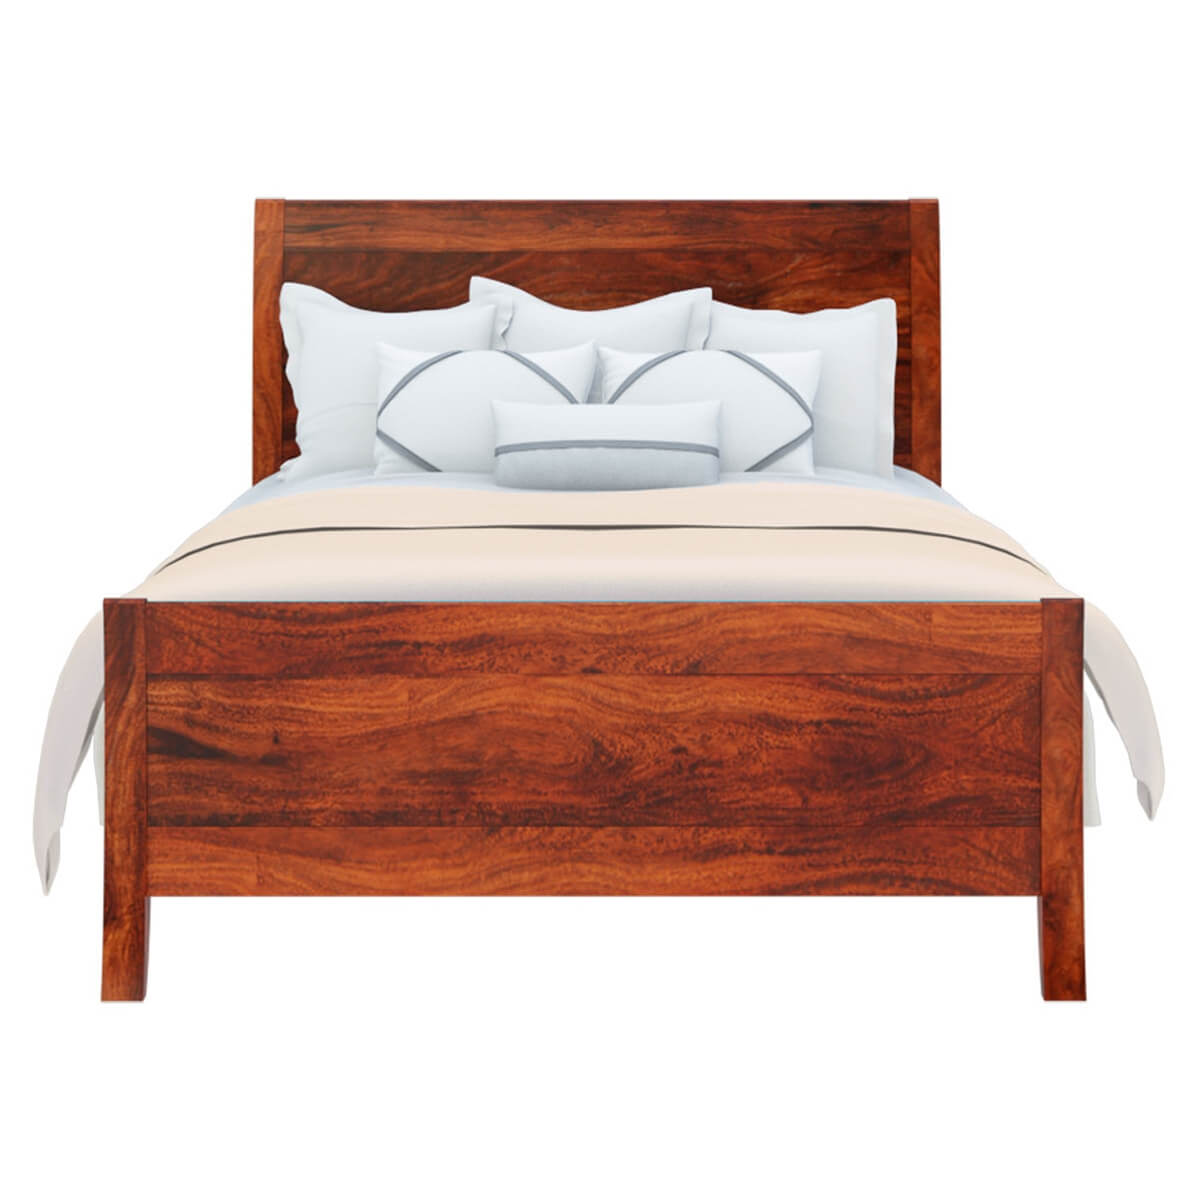 Handmade Solid Wood Island Units: Georgia Modern Solid Wood Handmade Full Size Platform Bed